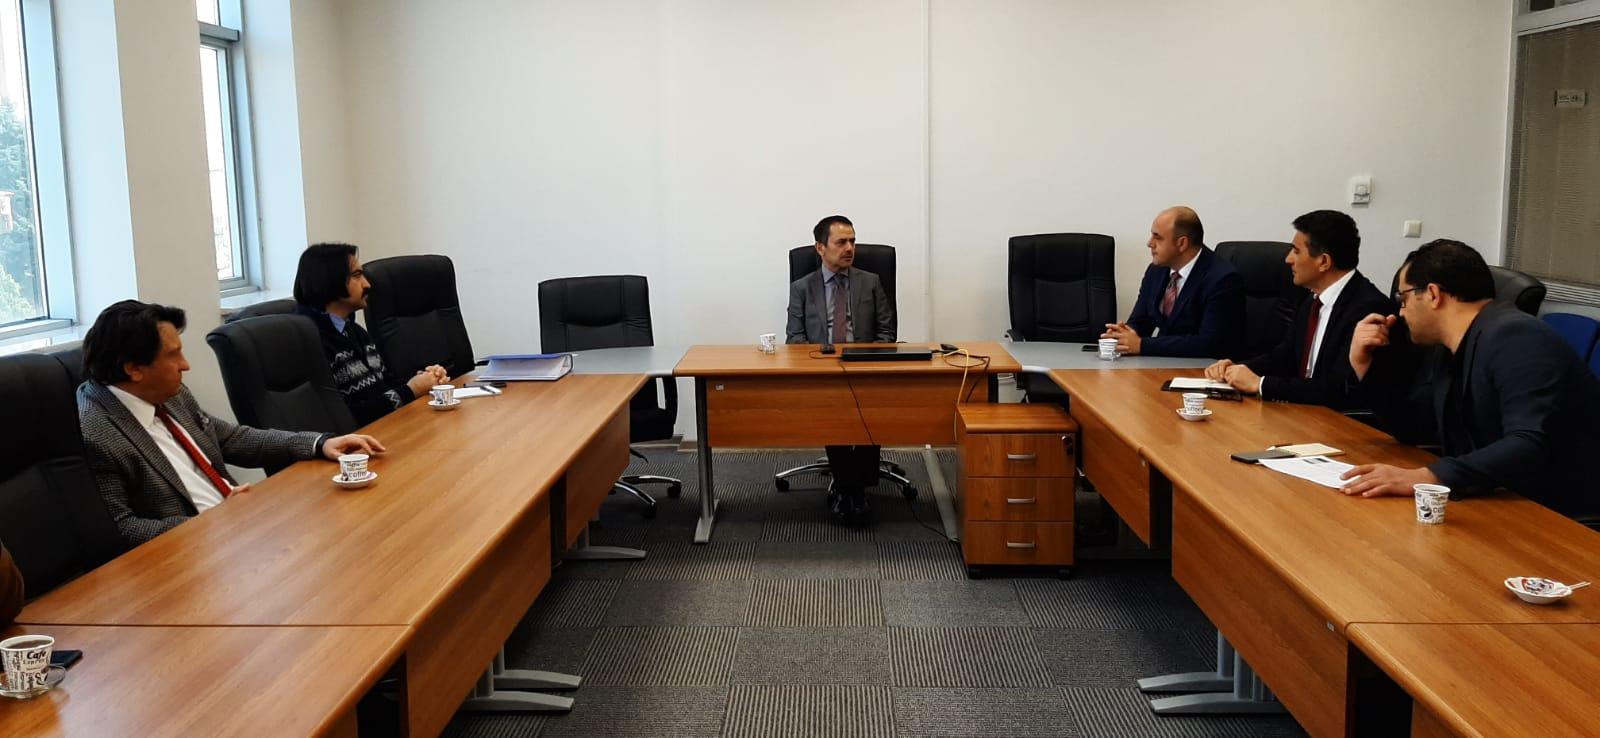 Nevşehir Valisi İlhami Aktaş, İl Sağlık Müdürlüğünü ziyaret etti.